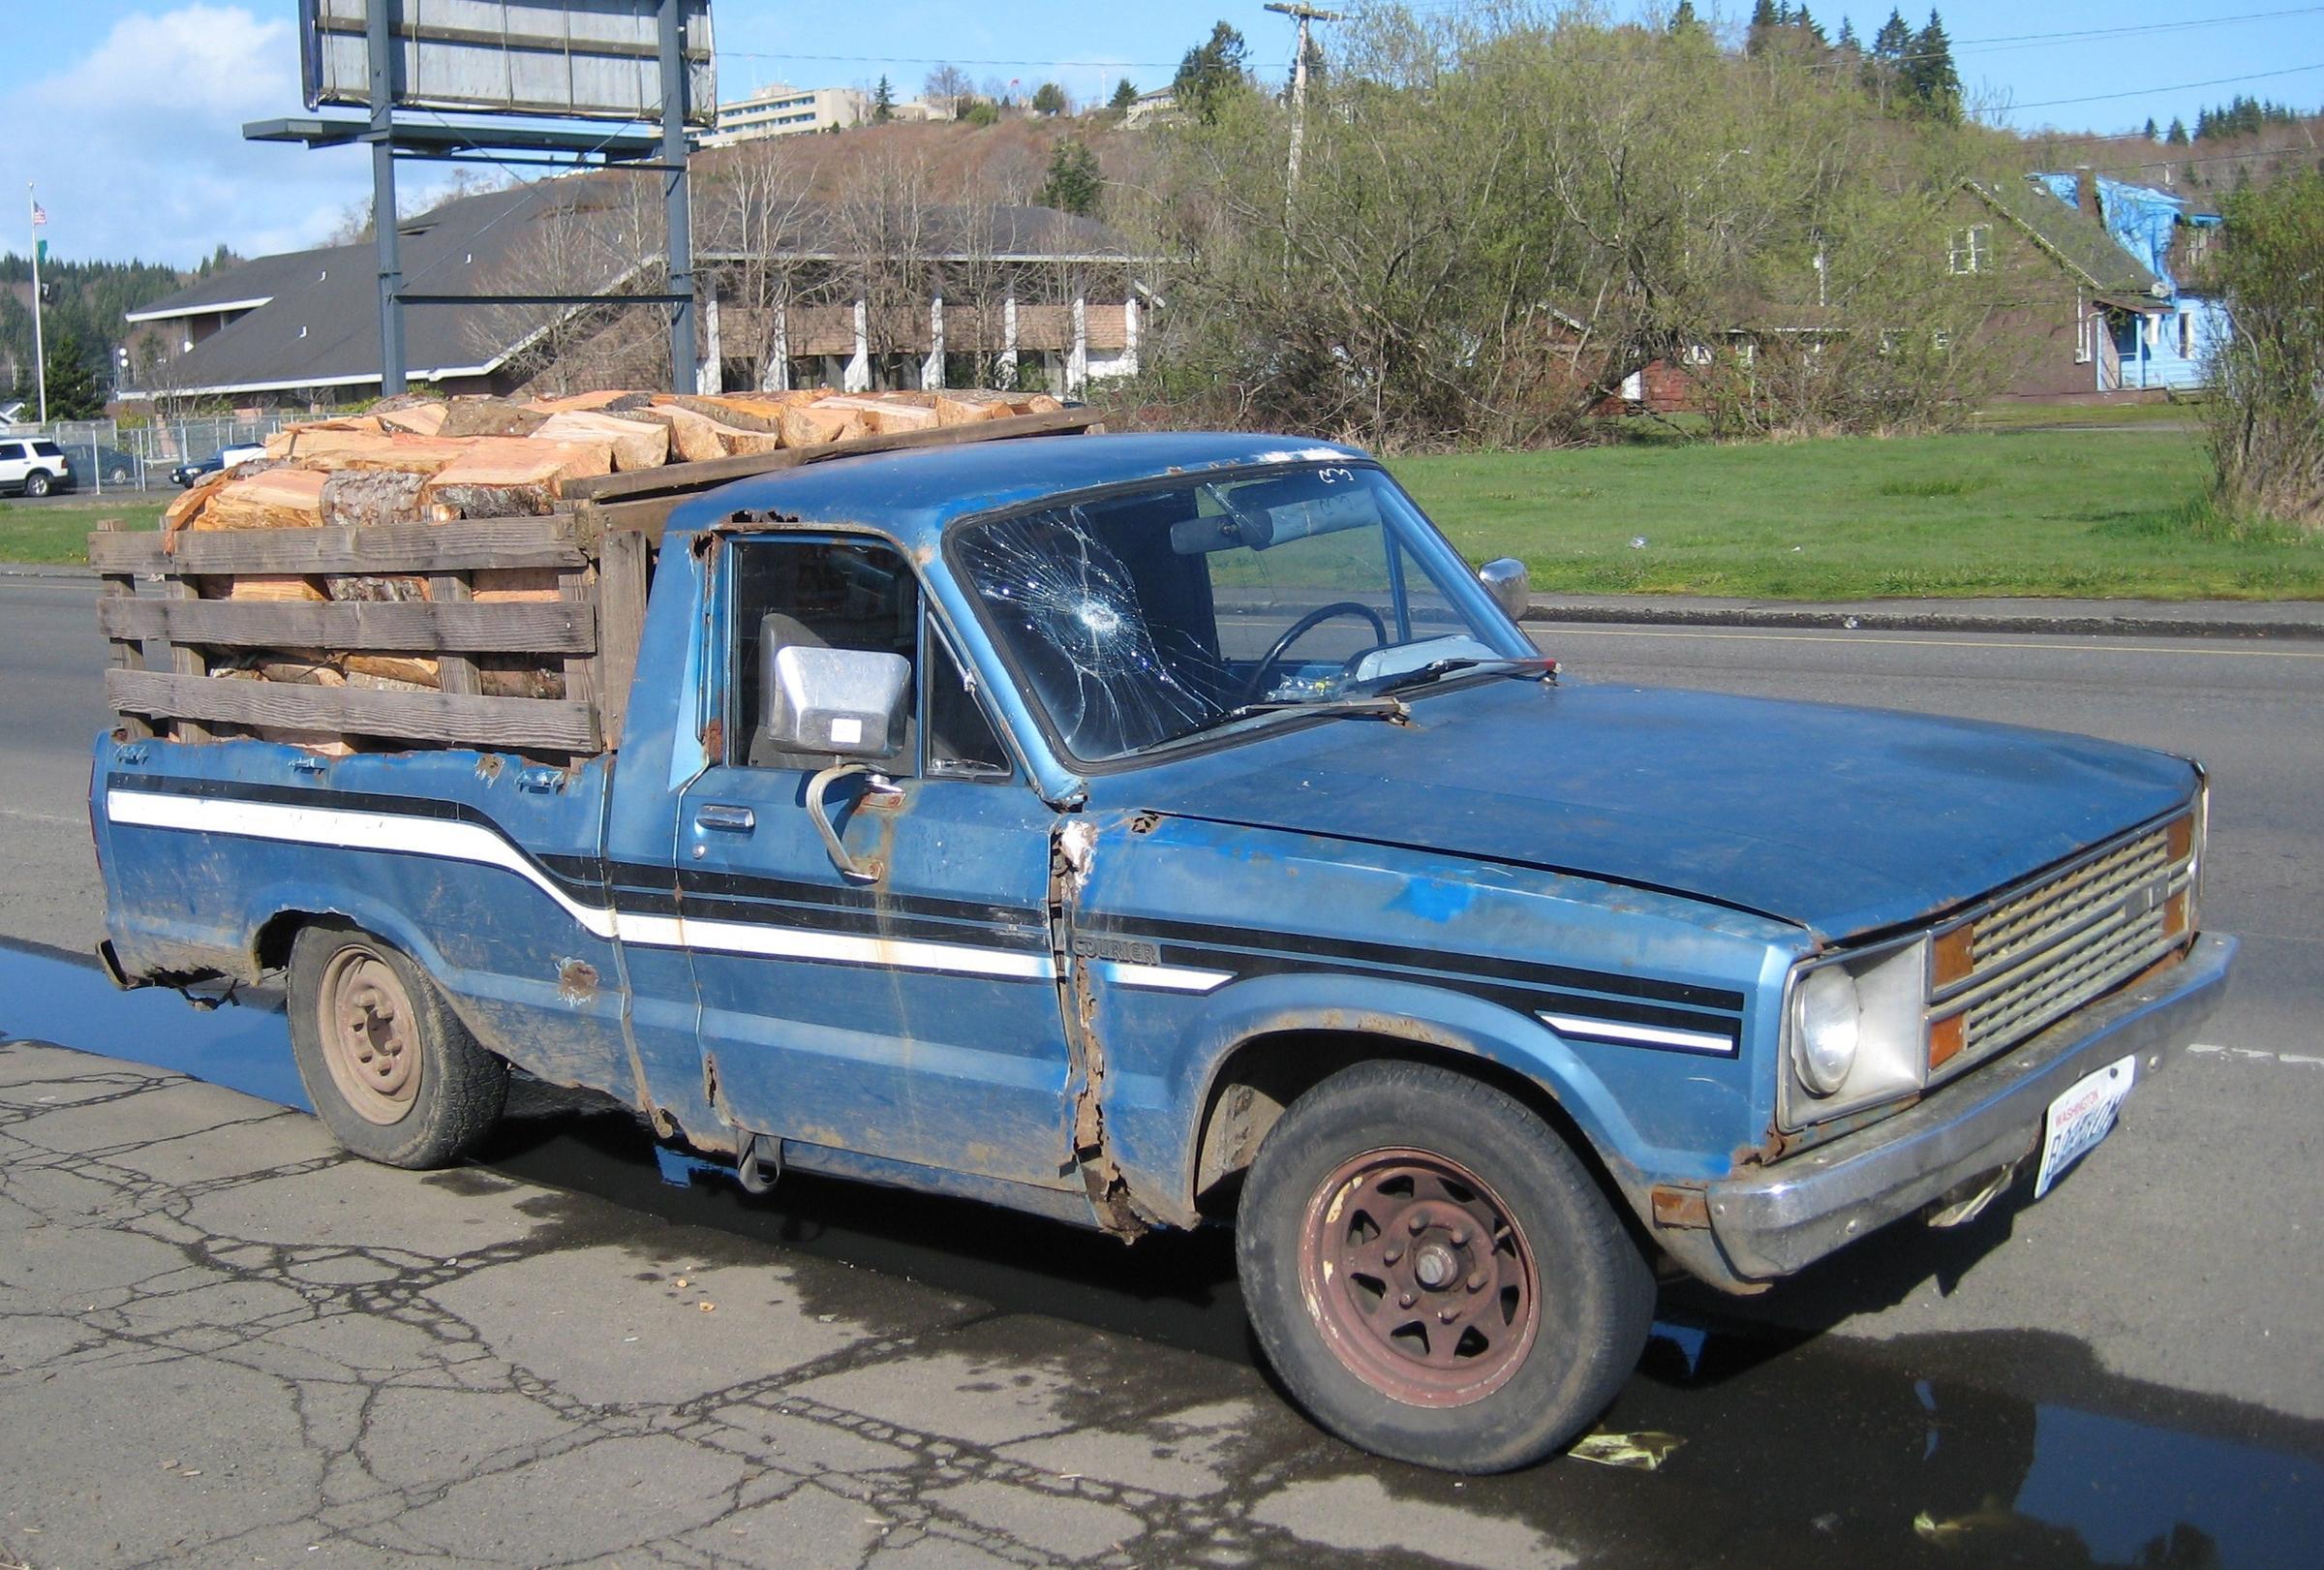 NHTSA: Take care of brake lines on old trucks | Michigan Radio